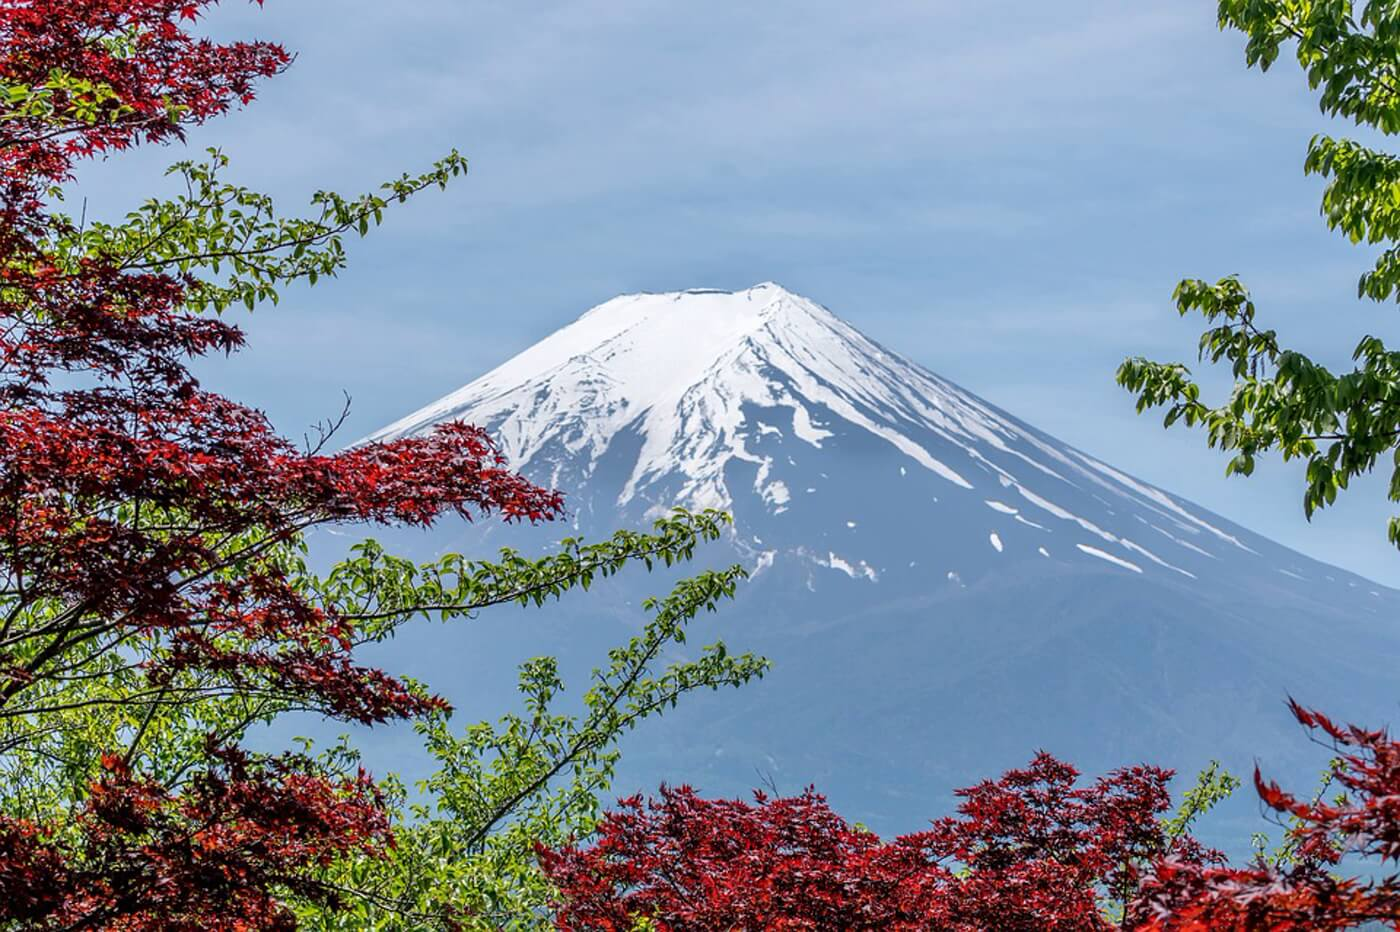 shichimi-togarashi-du-japon